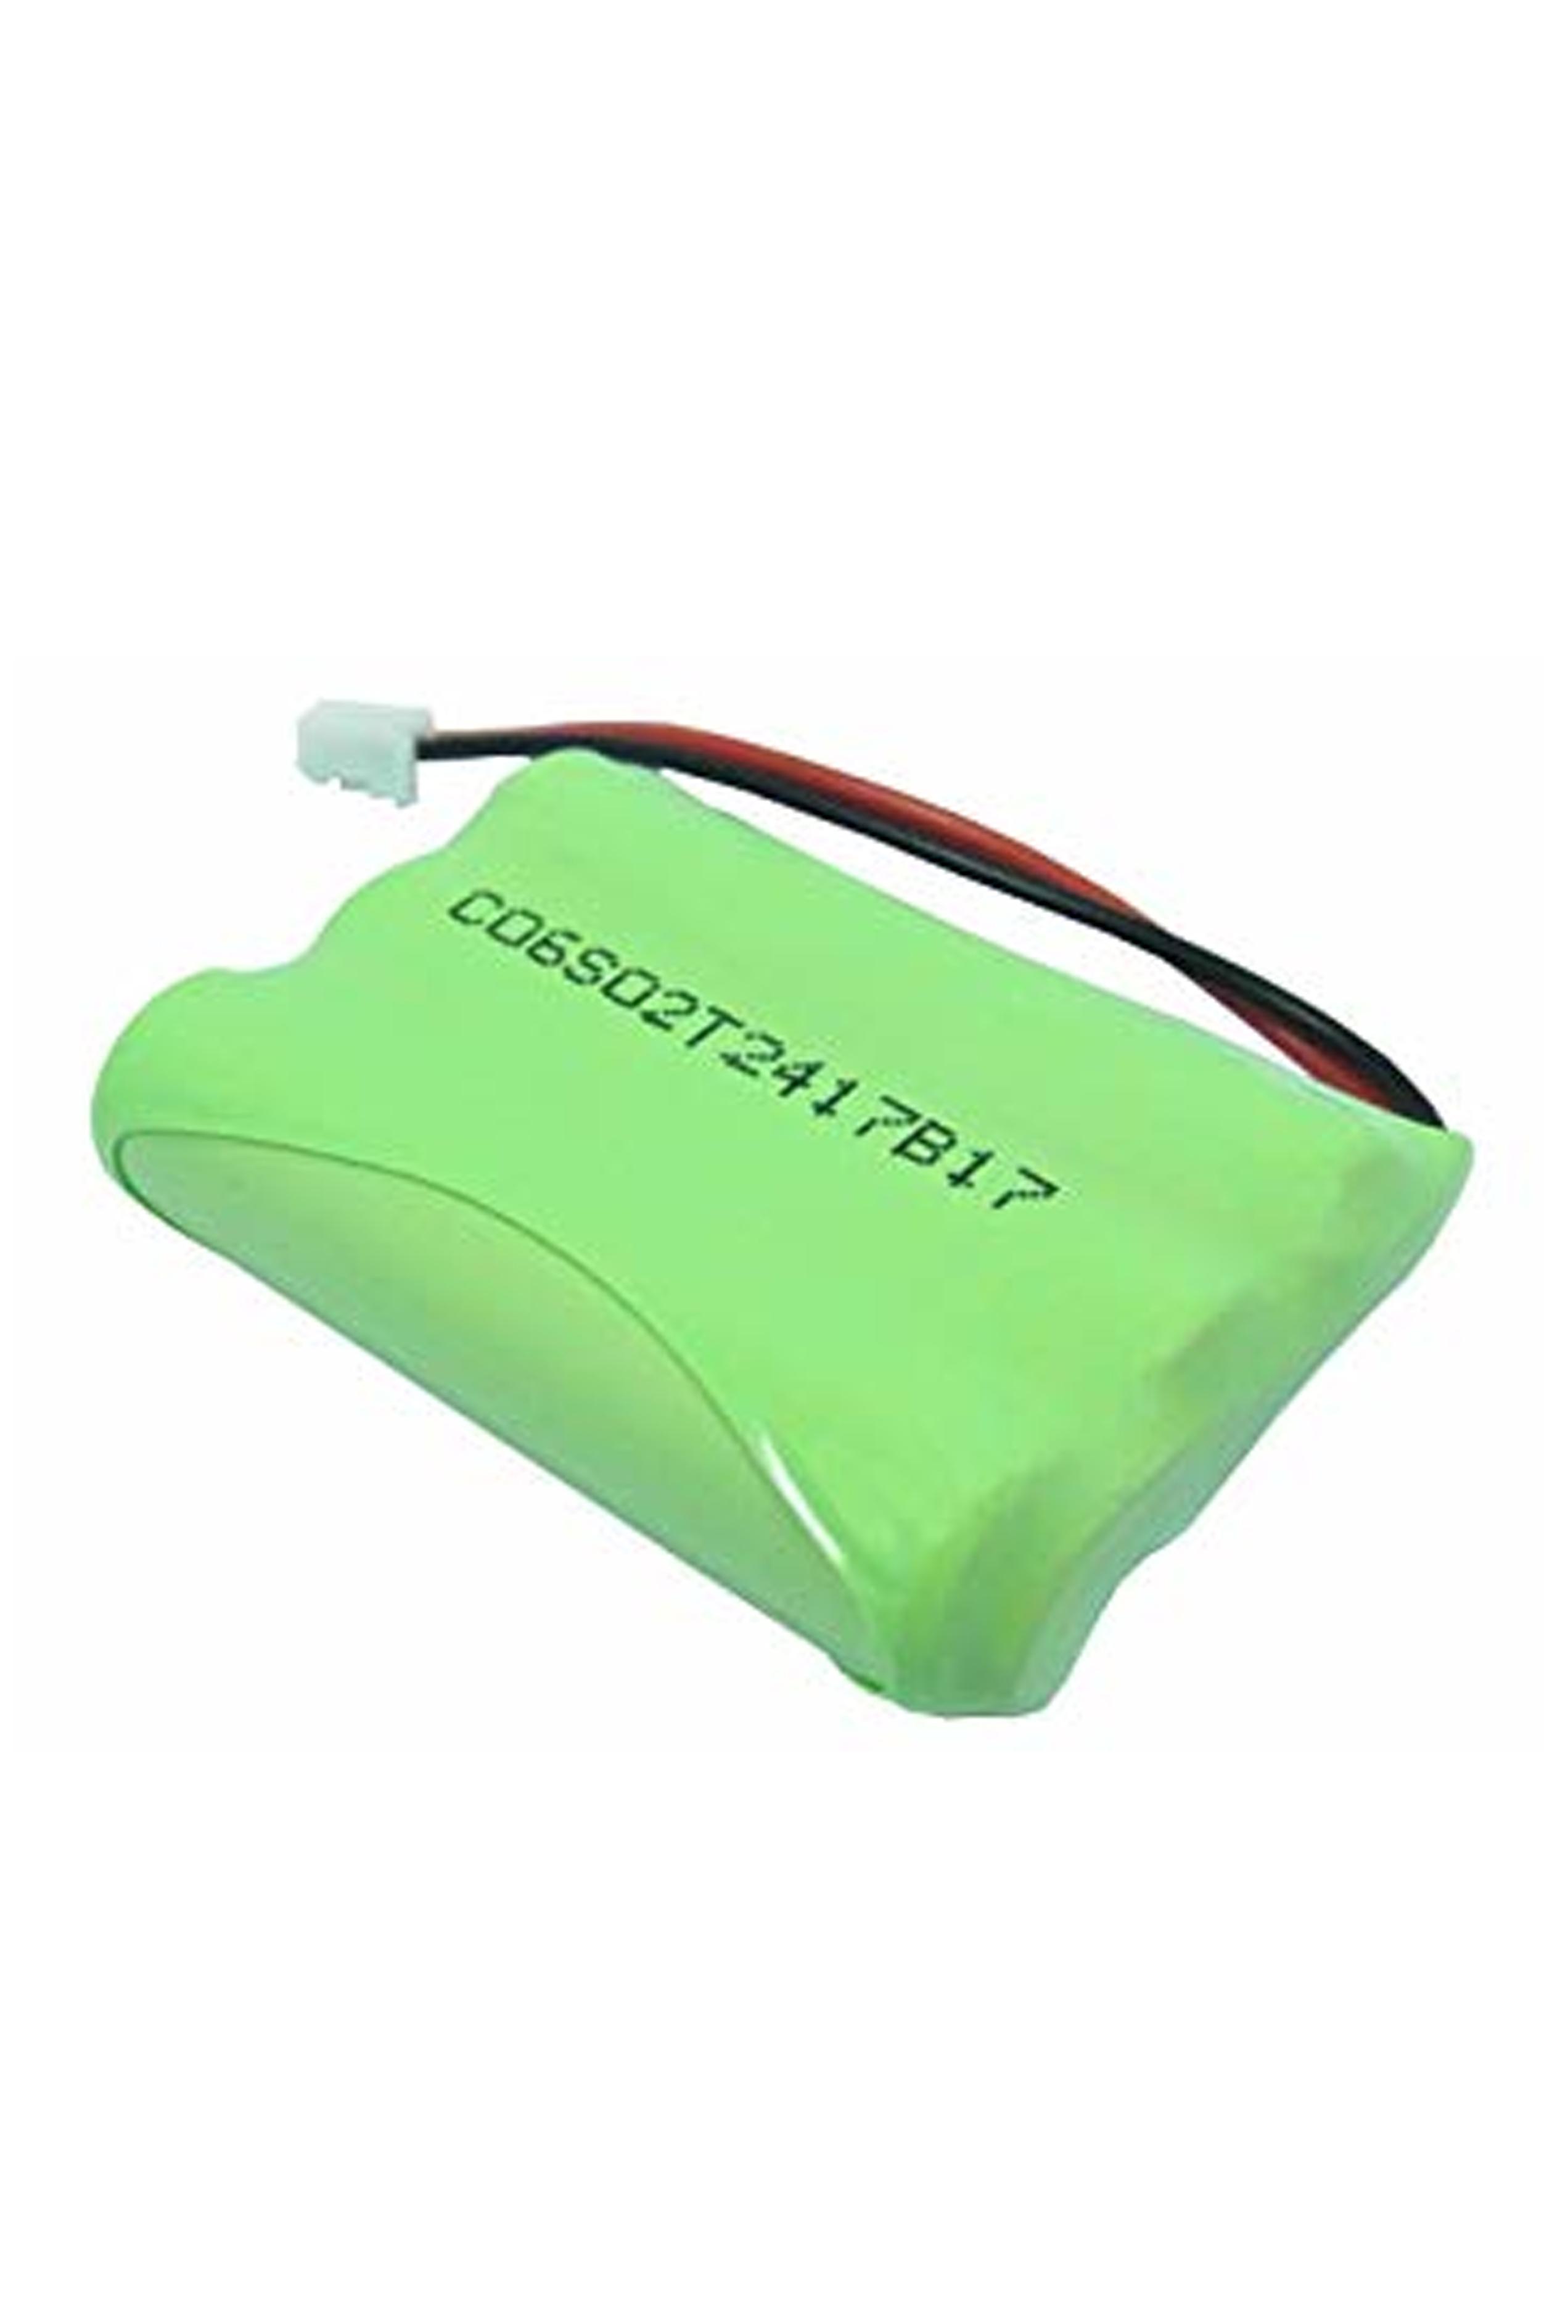 Brother 5.8 GHz Digital Cordless Handset (BCLD10)